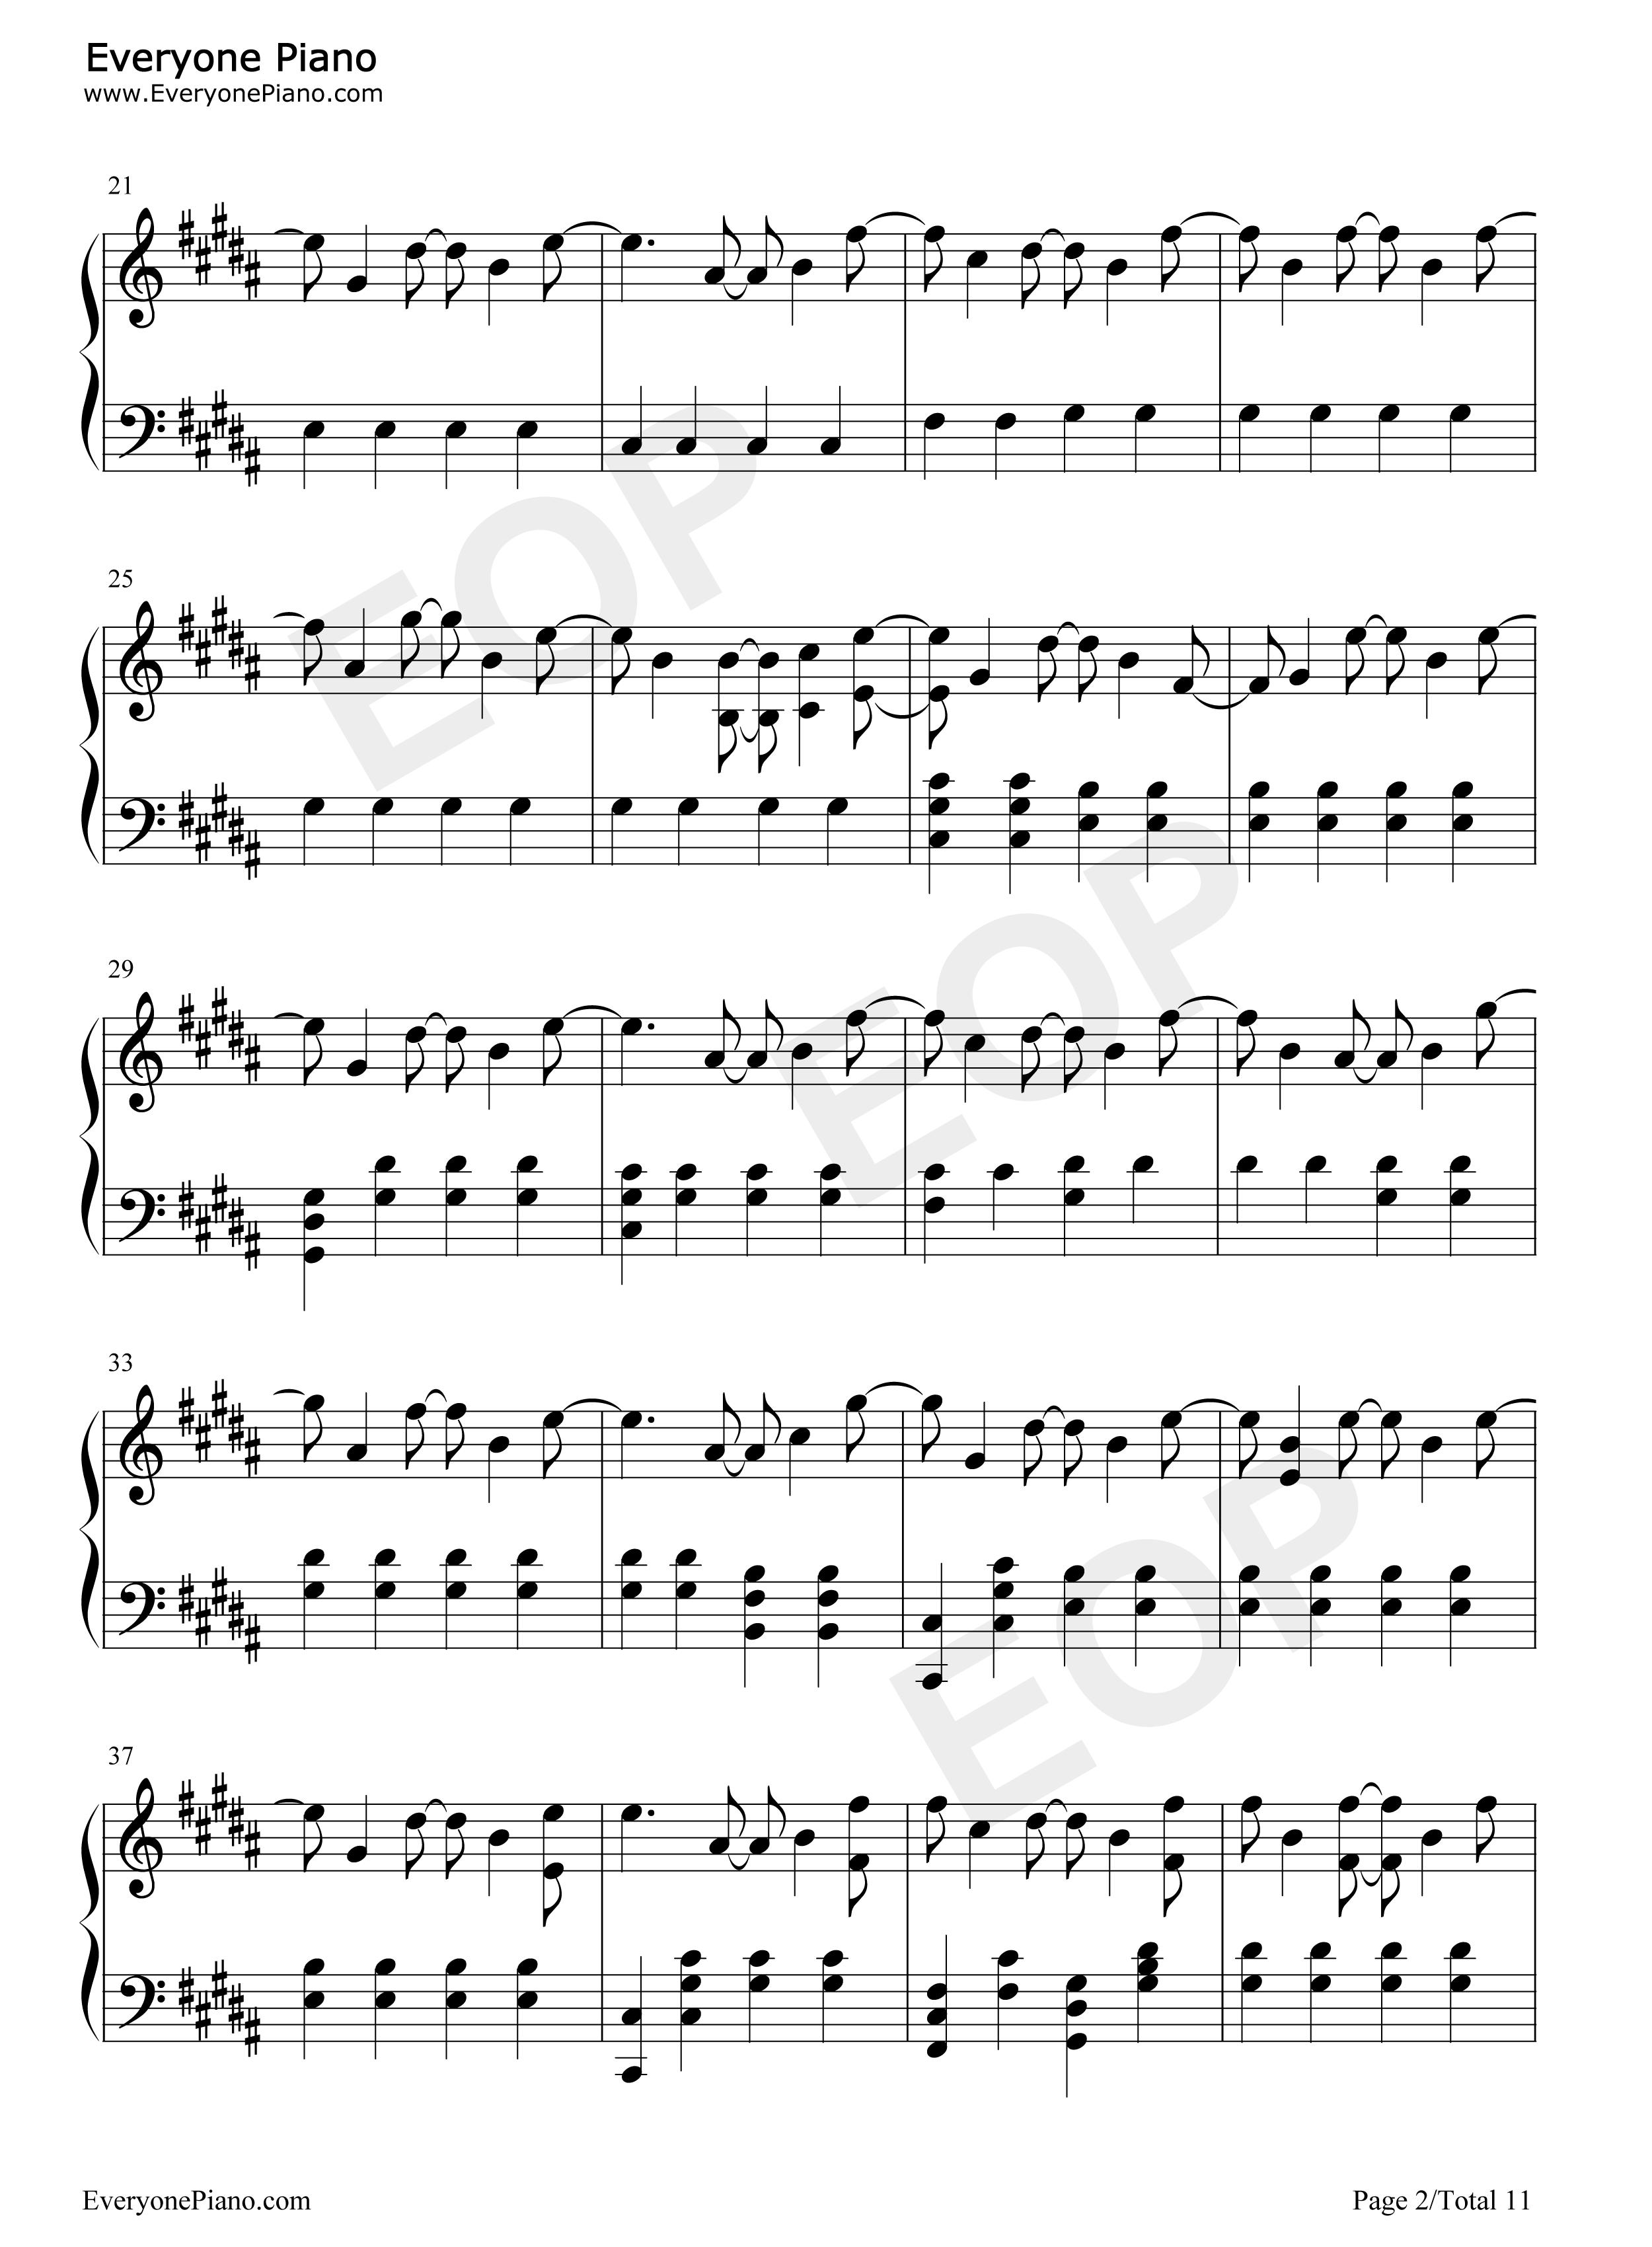 Deadmau5 strobe evan duffy version (piano tutorial) youtube.